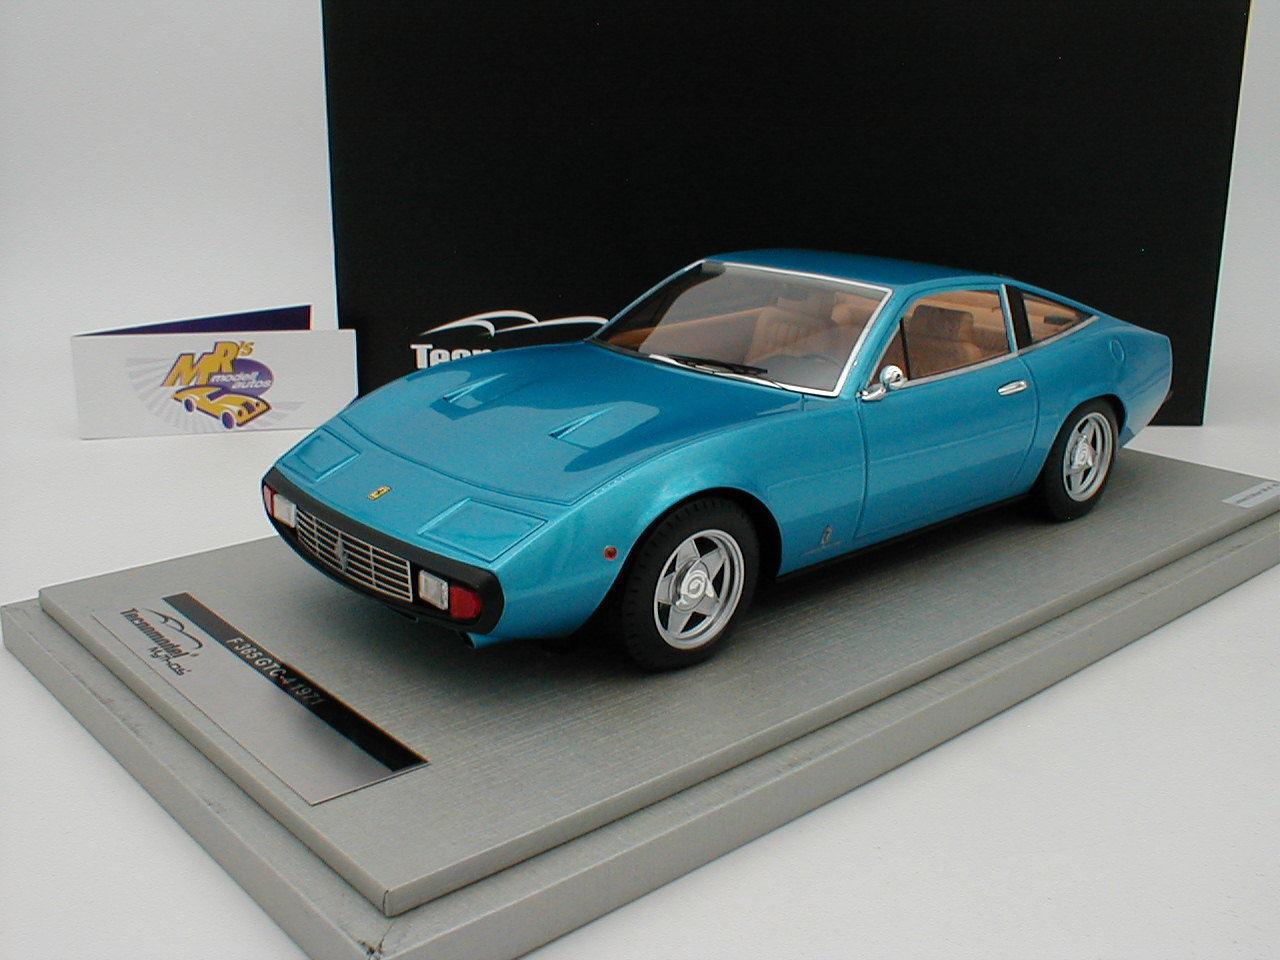 Tecnomodel tm18-92c - ferrari 365 gtc 4 año 1971  metalizado azul  1 18 nuevo